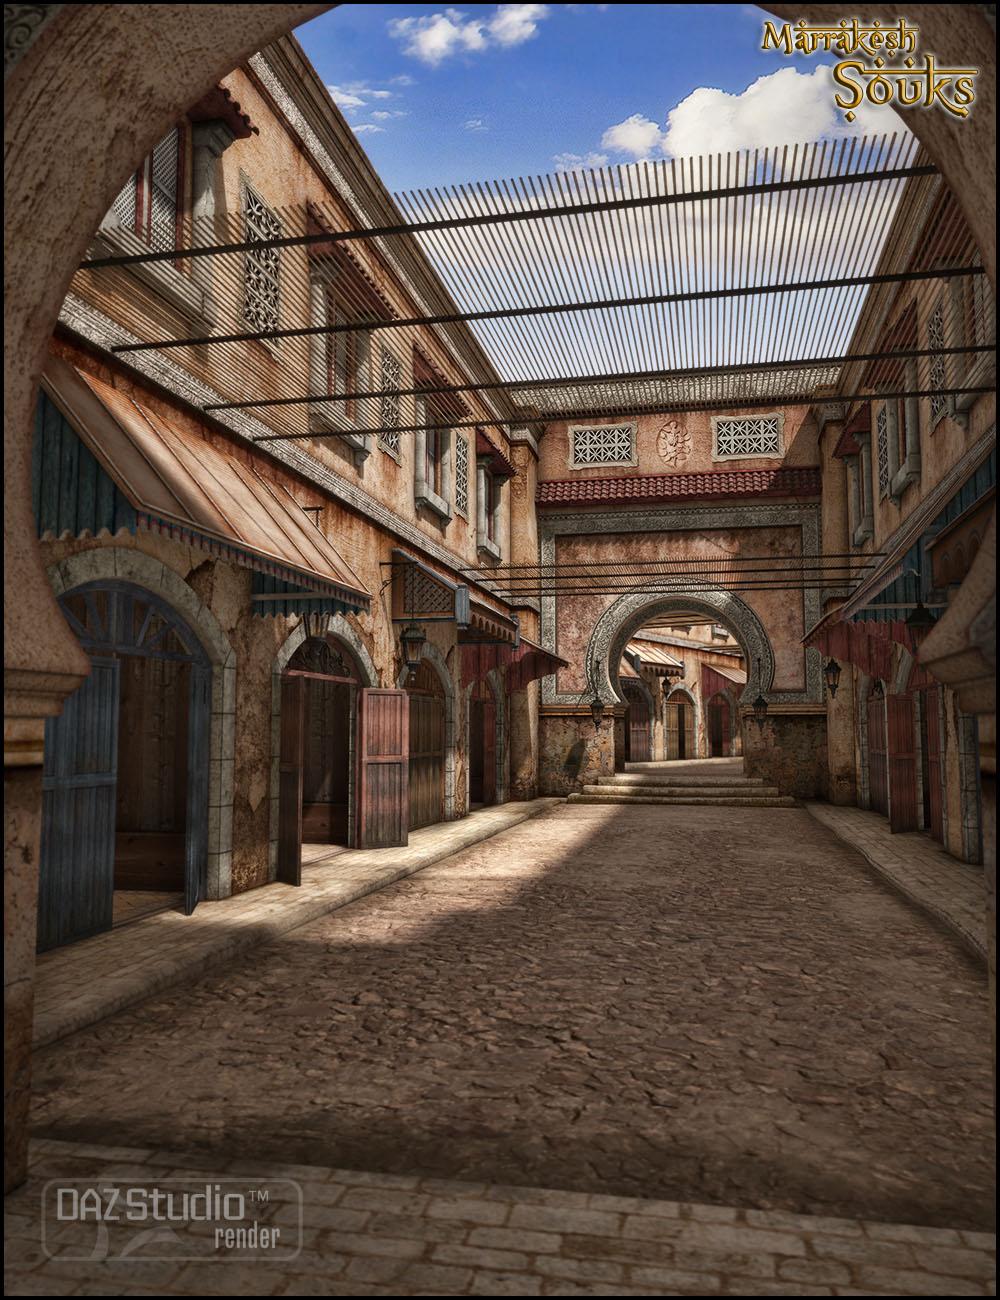 Marrakesh Souks 2012 by: Jack Tomalin, 3D Models by Daz 3D